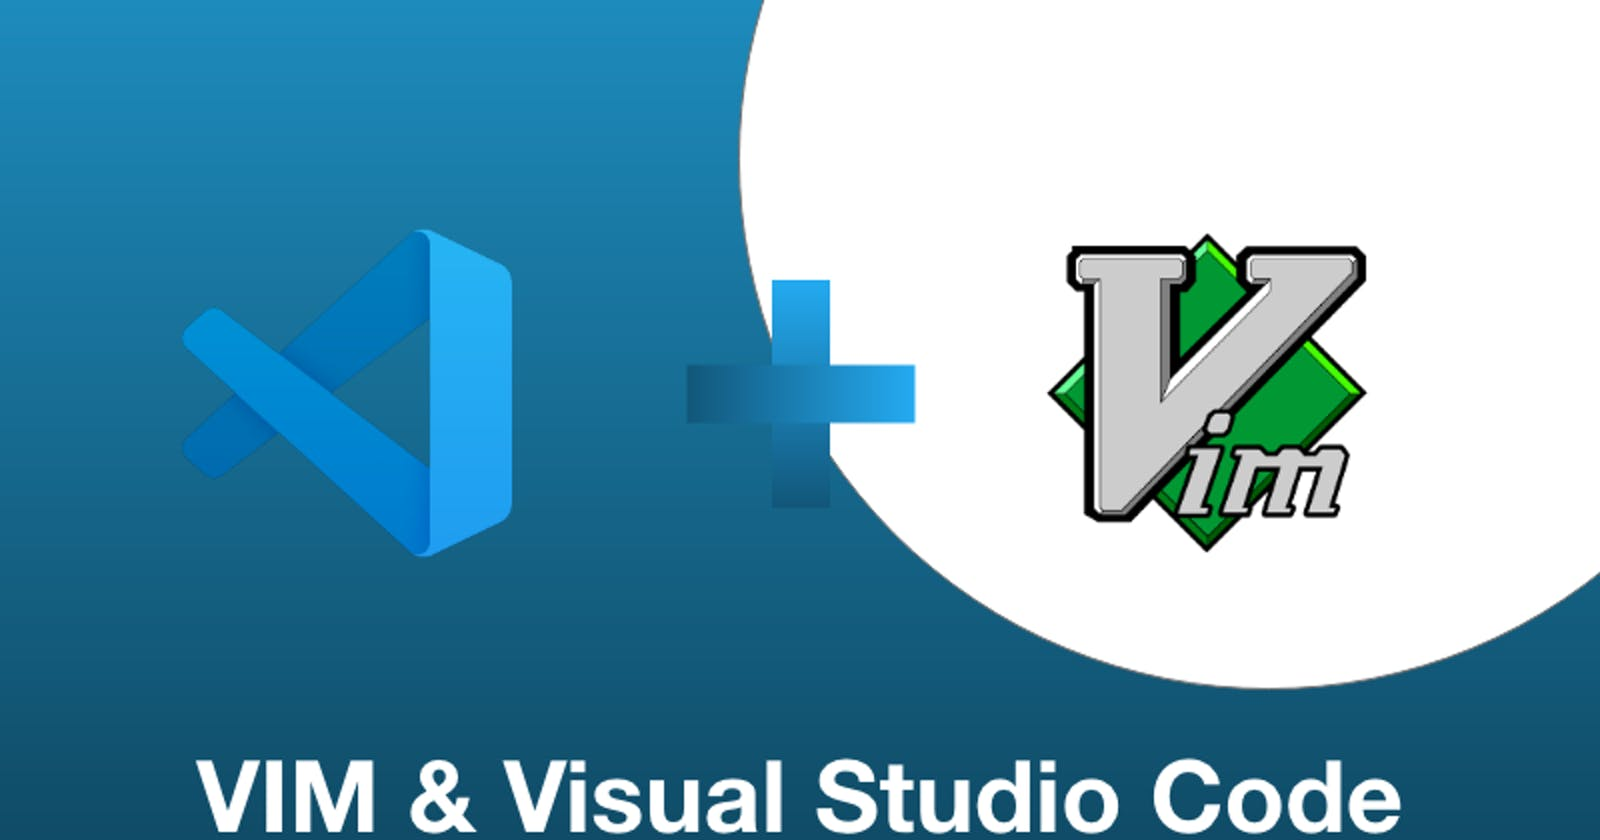 VIM & Visual Studio Code Tips & Tricks (With Video / GIF)